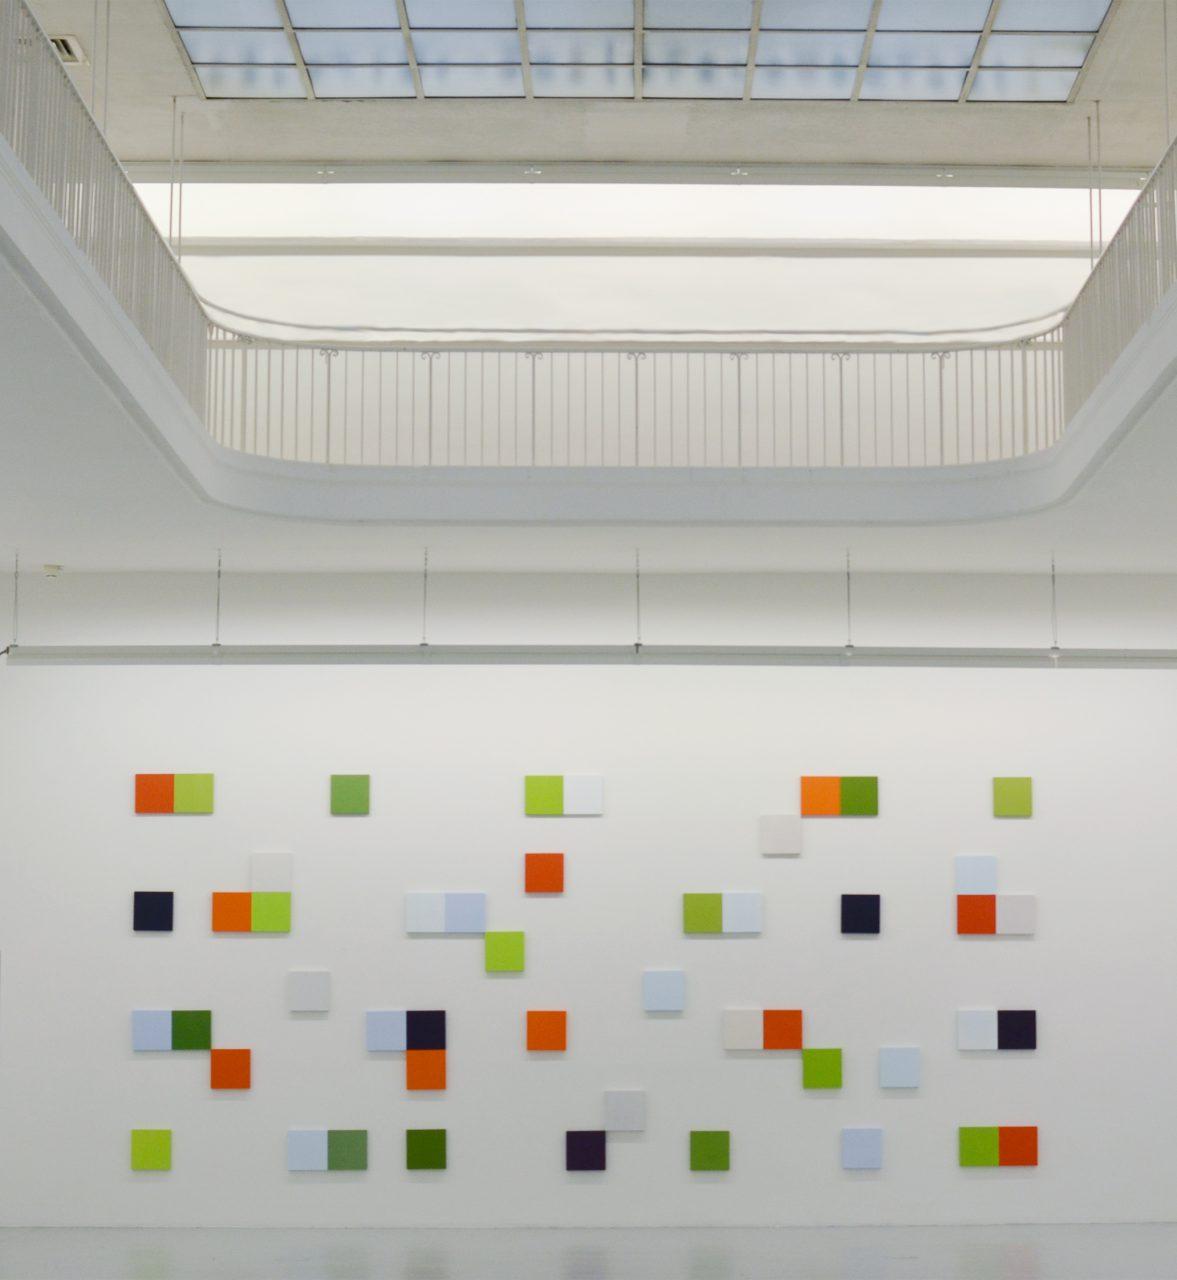 Pixelspace | Kunstverein Freiburg, Germany, 2012